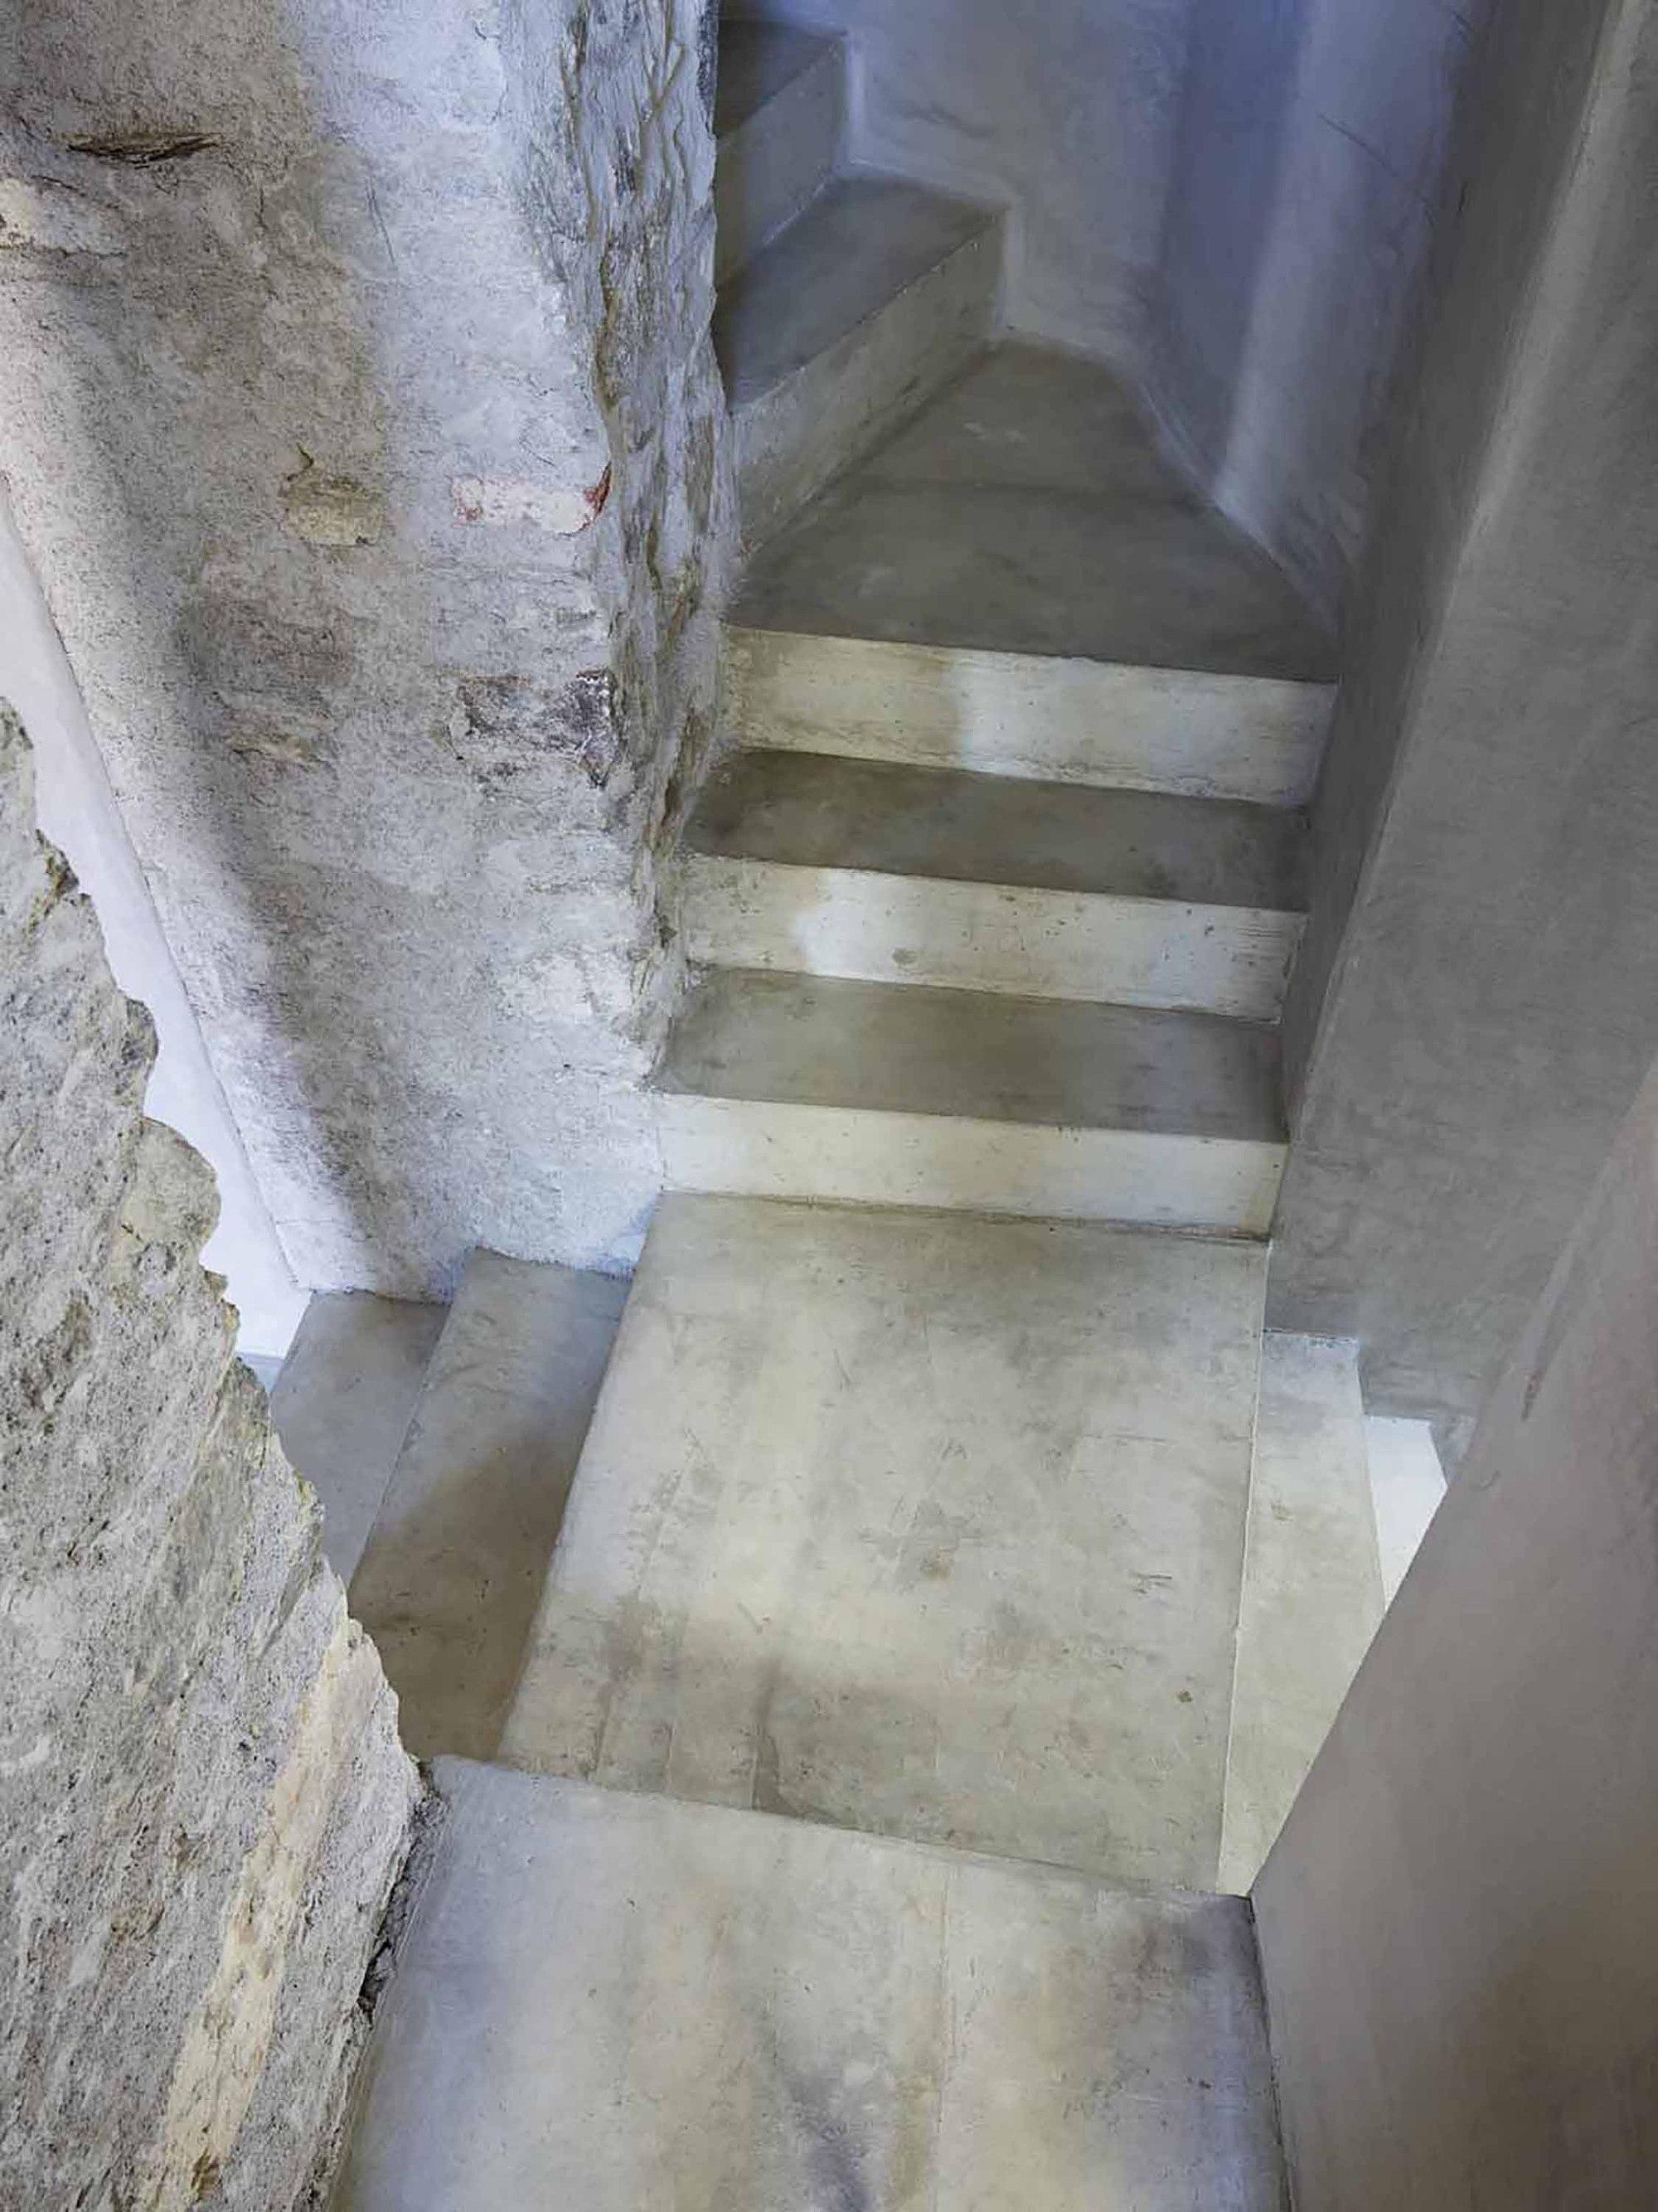 543dd65cc07a80762d000253_stone-house-transformation-in-scaiano-wespi-de-meuron-romeo-architects_1430_cf031272.jpg